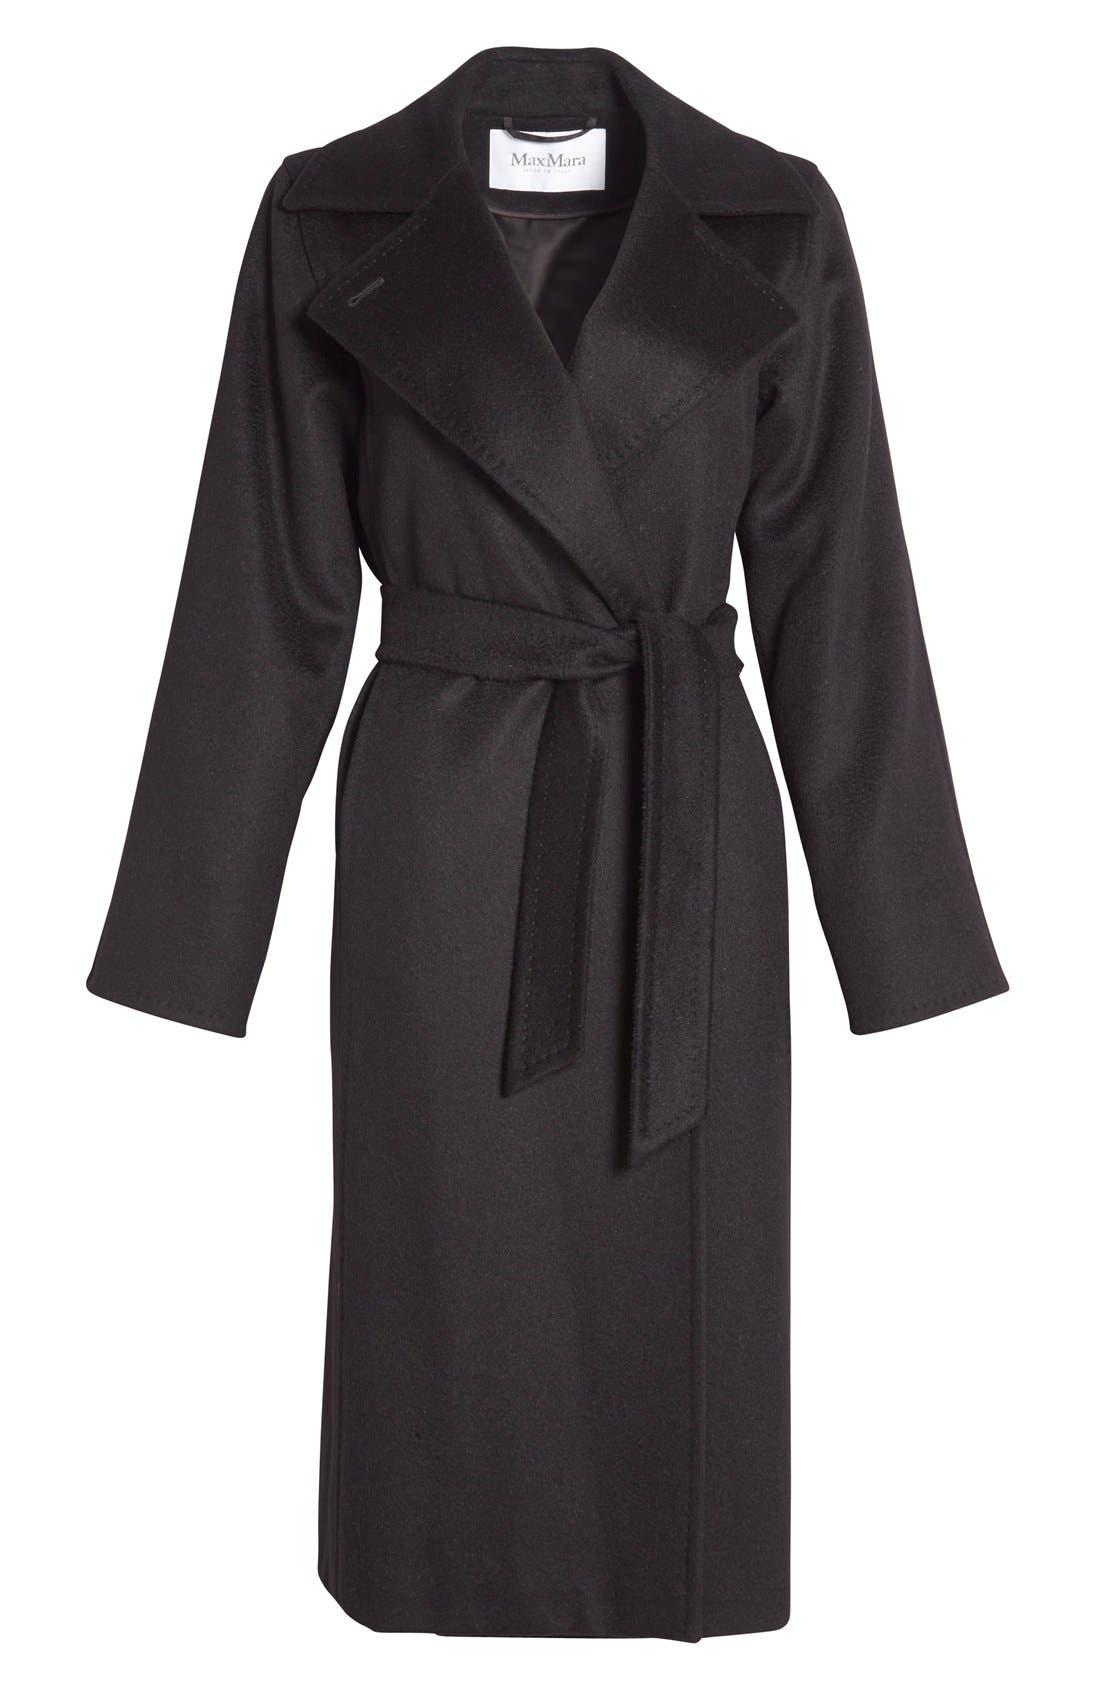 MAX MARA, 'Manuela' Camel Hair Coat, Alternate thumbnail 4, color, BLACK